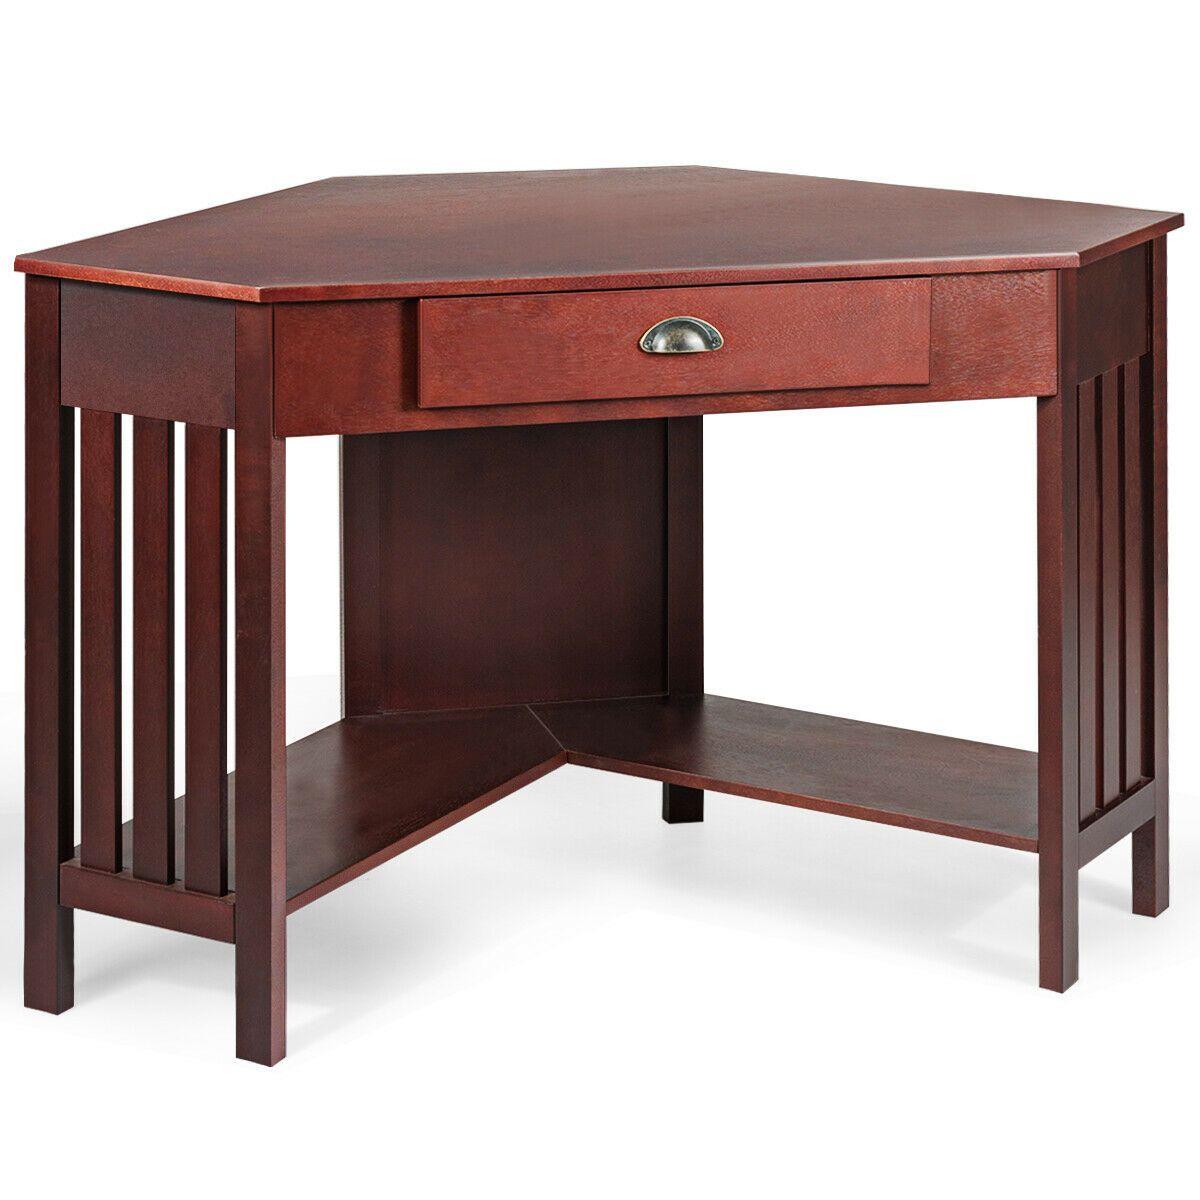 Corner Writing Desk with Drawer & Shelves Writing desk